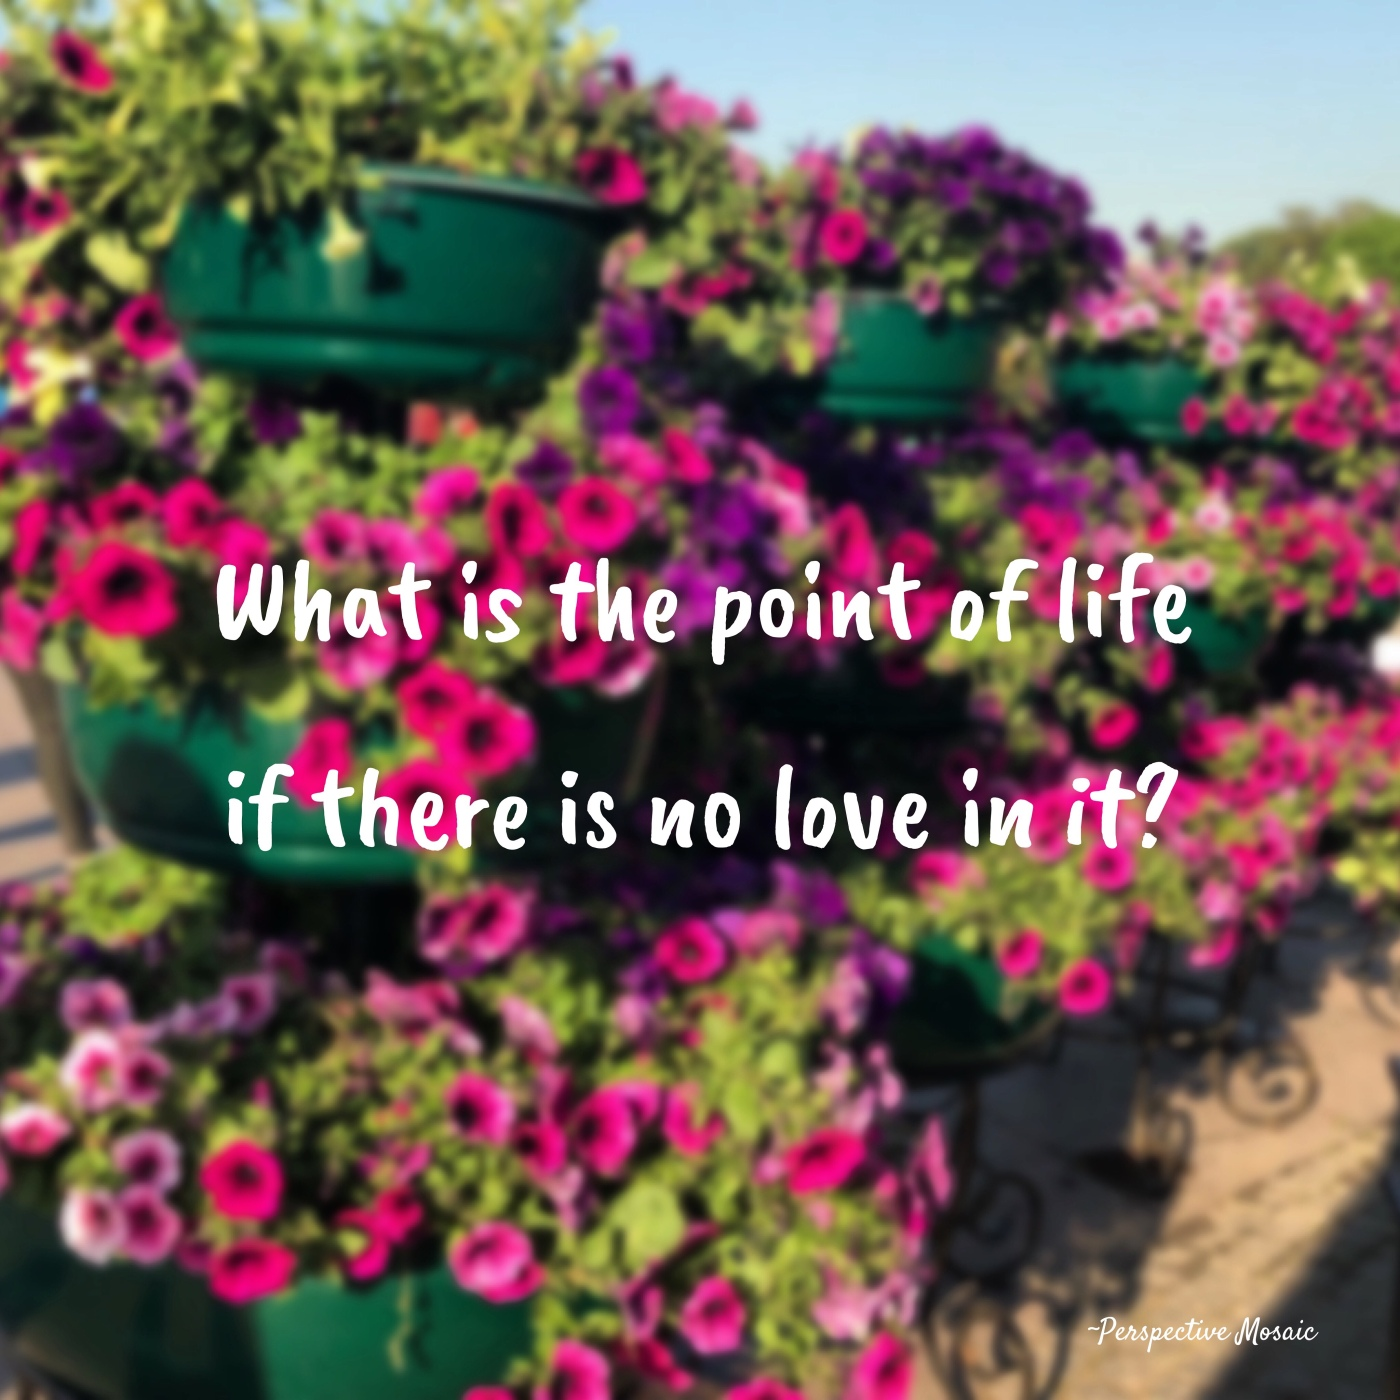 Life love perspective mosaic Nicole paralkar